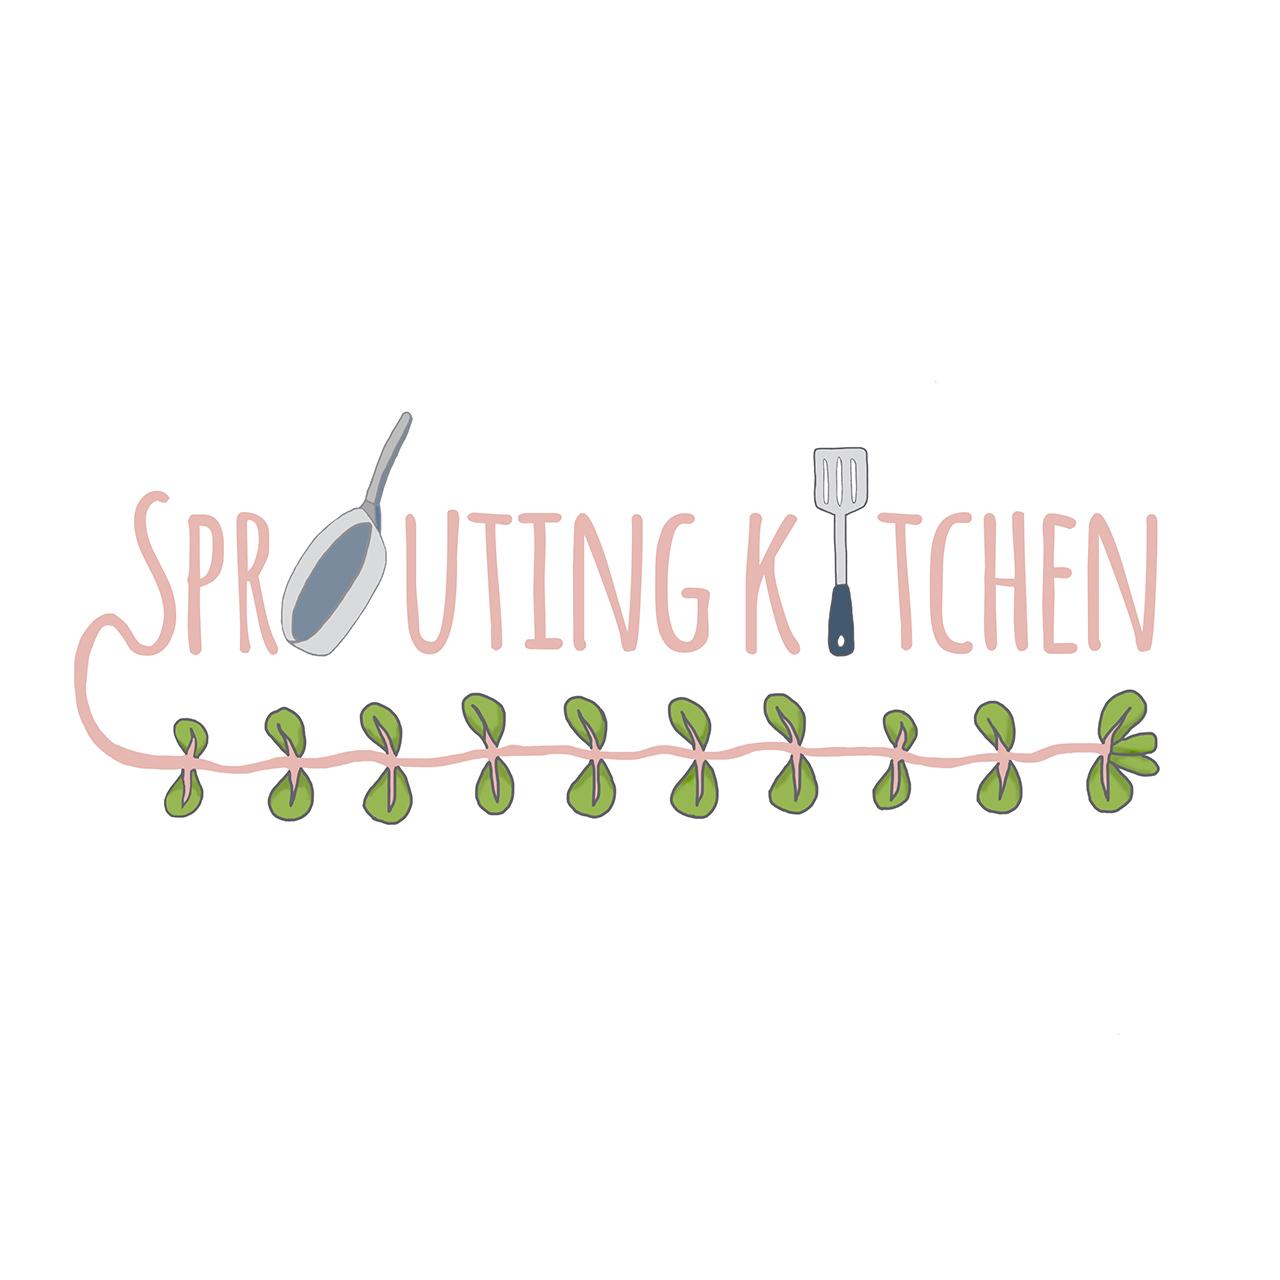 SPROUTING KITCHEN